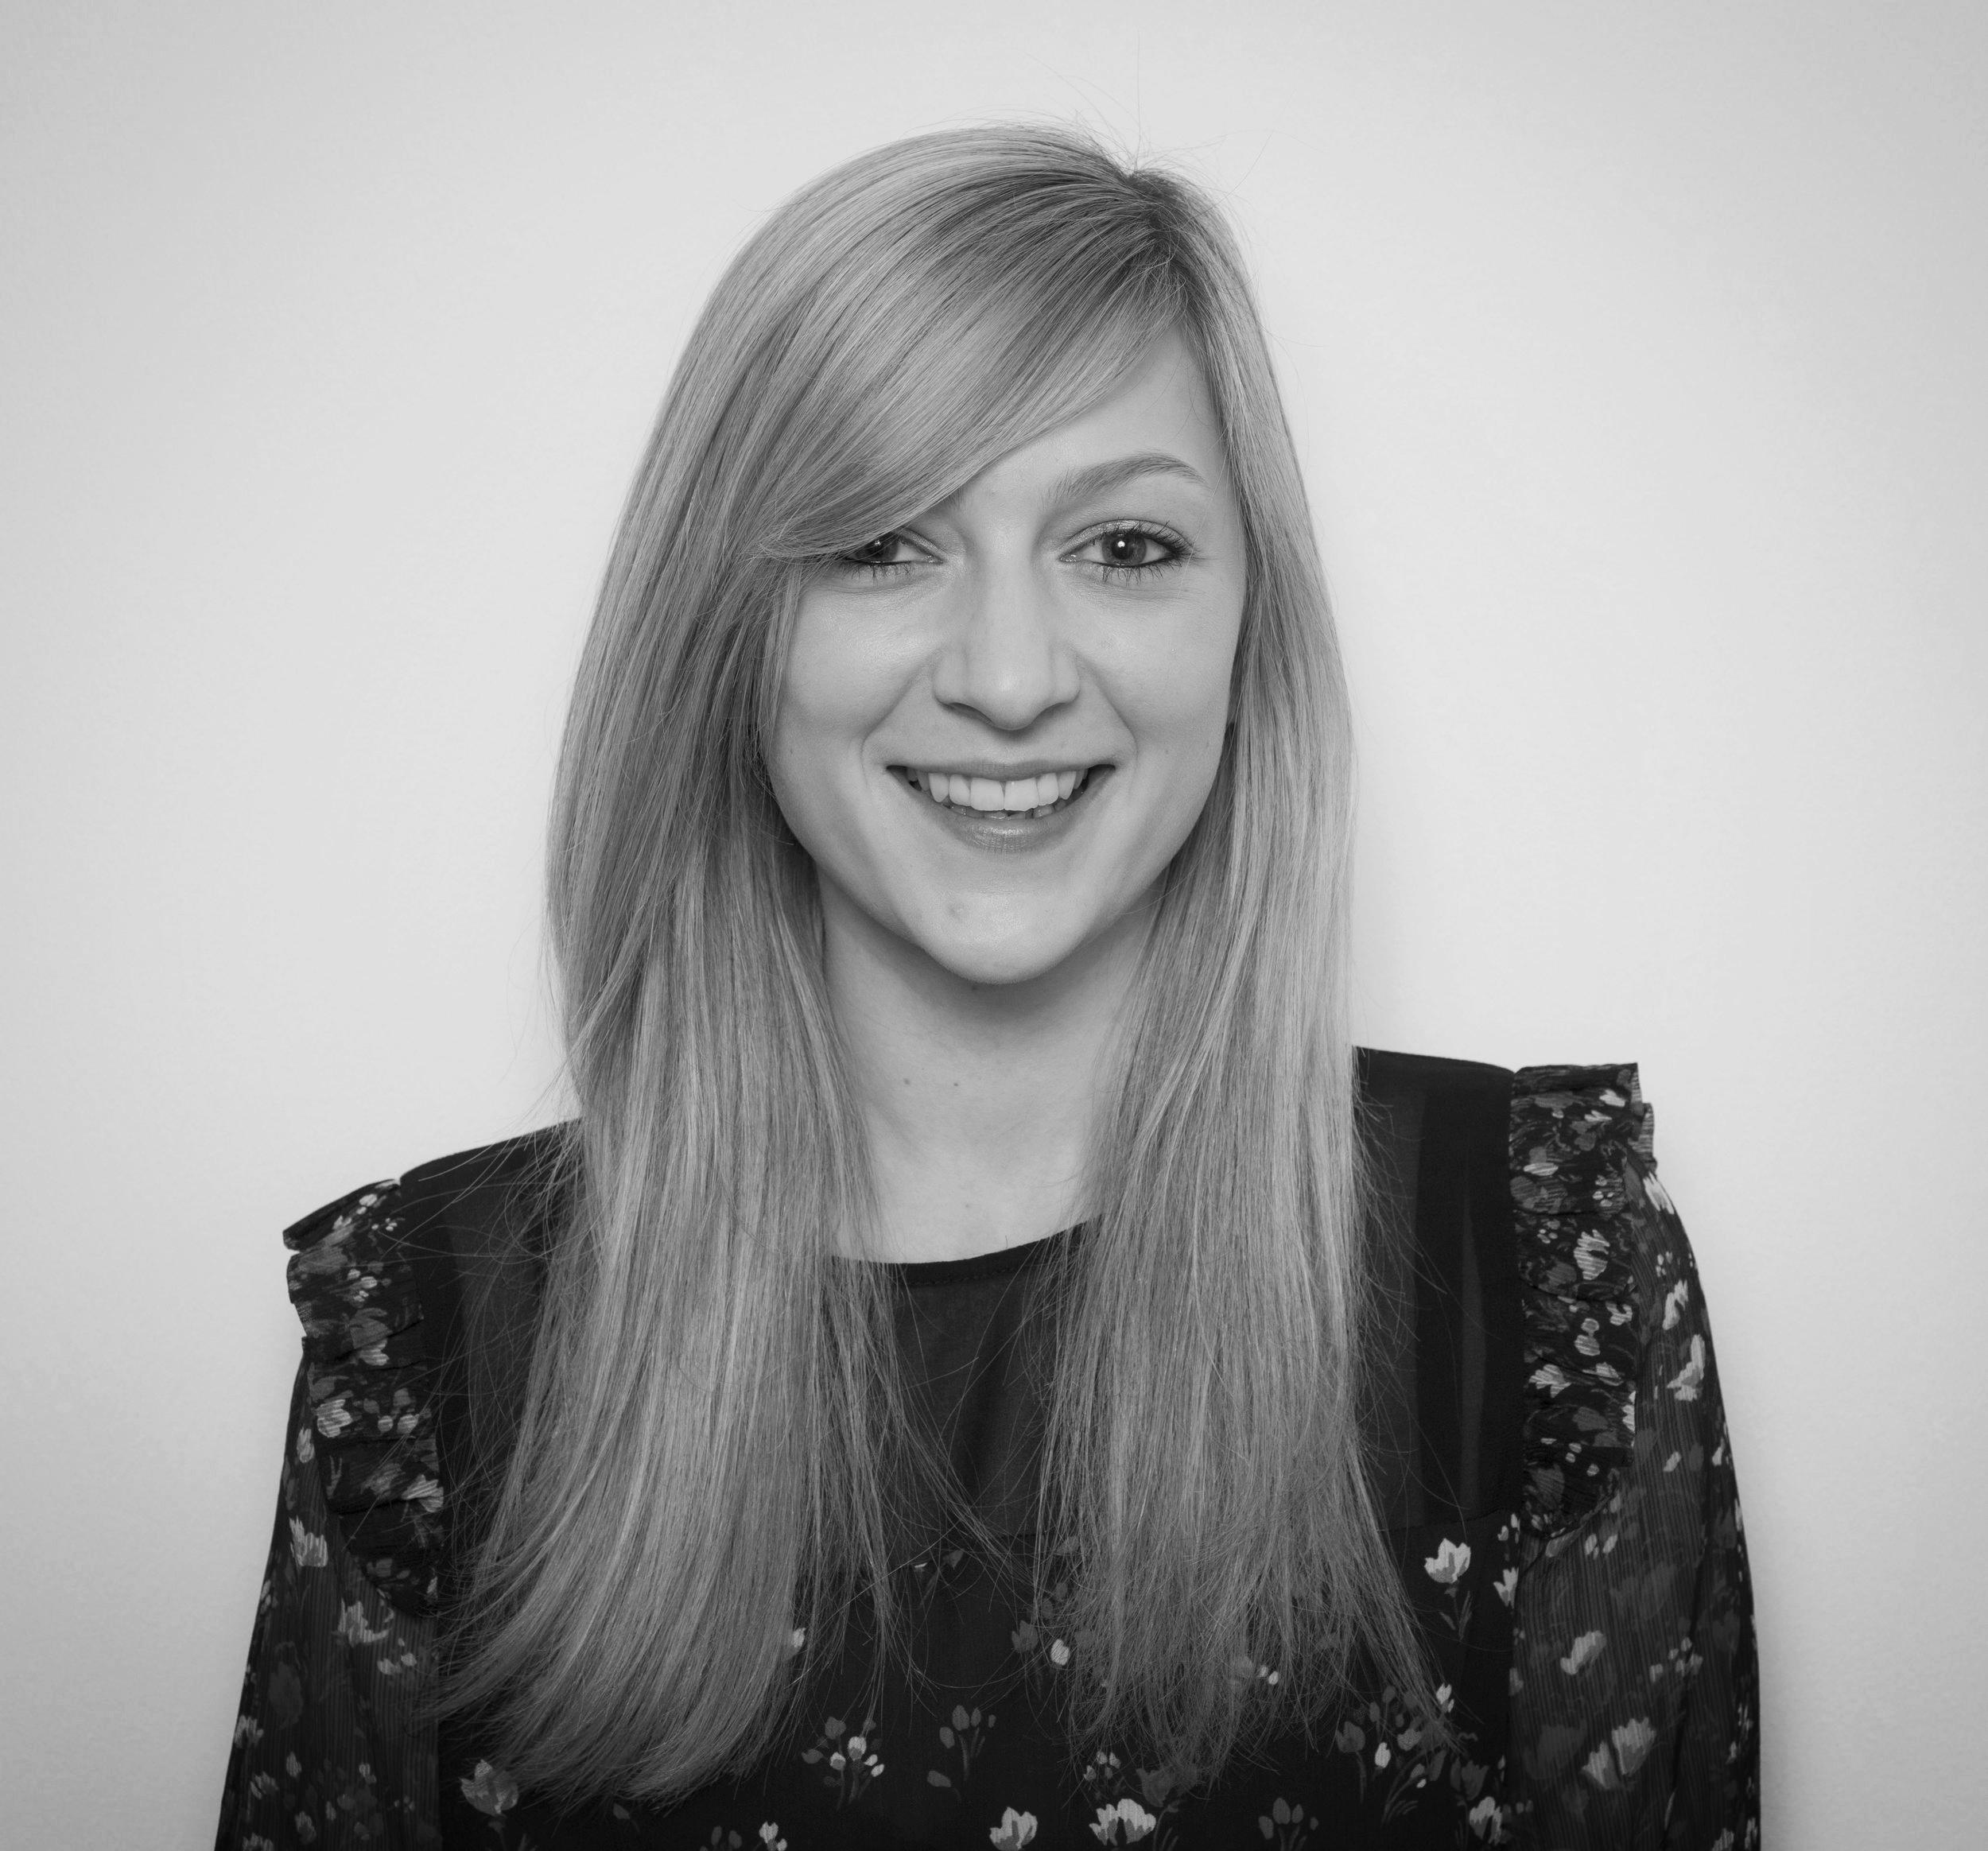 <b>Kristina Bassett</b><br>Senior Account Manager, Lifestyle